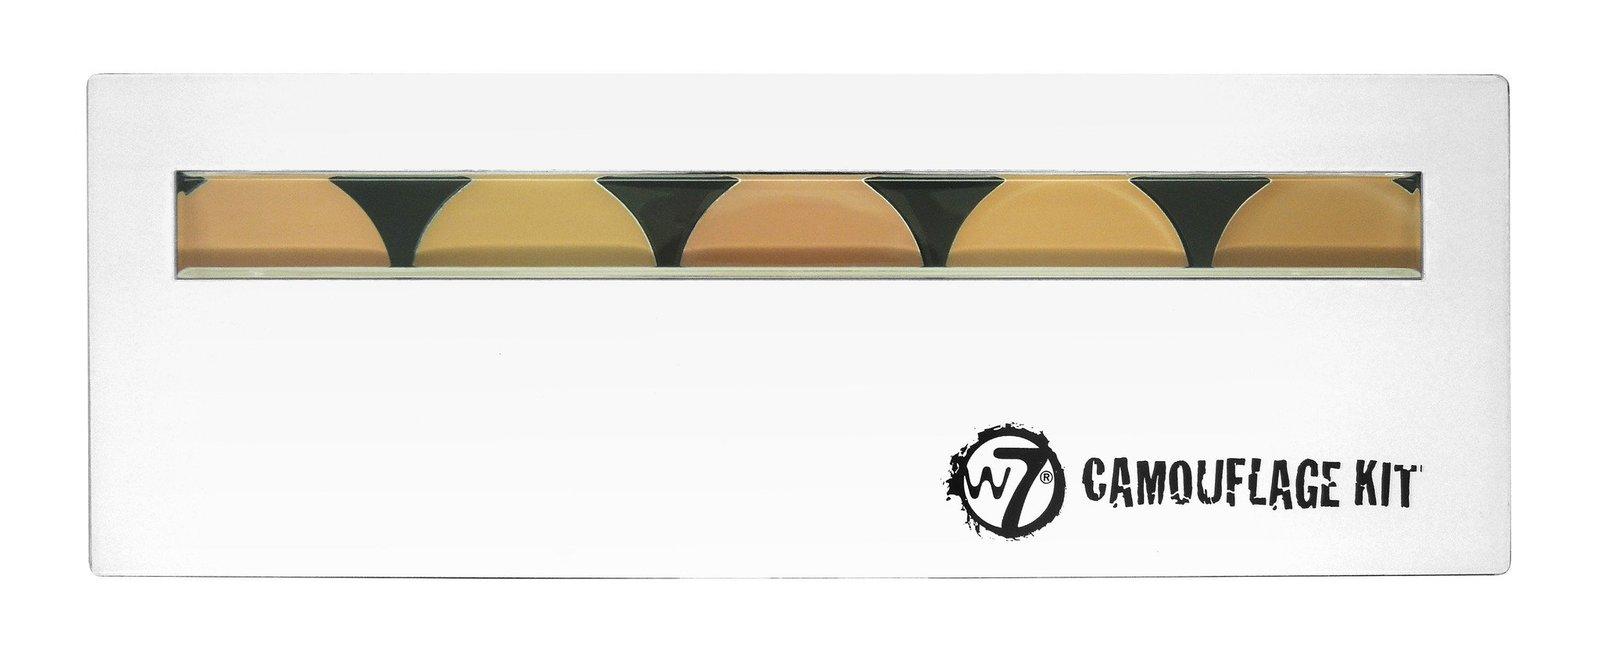 W7 Camouflage Kit Concealer image